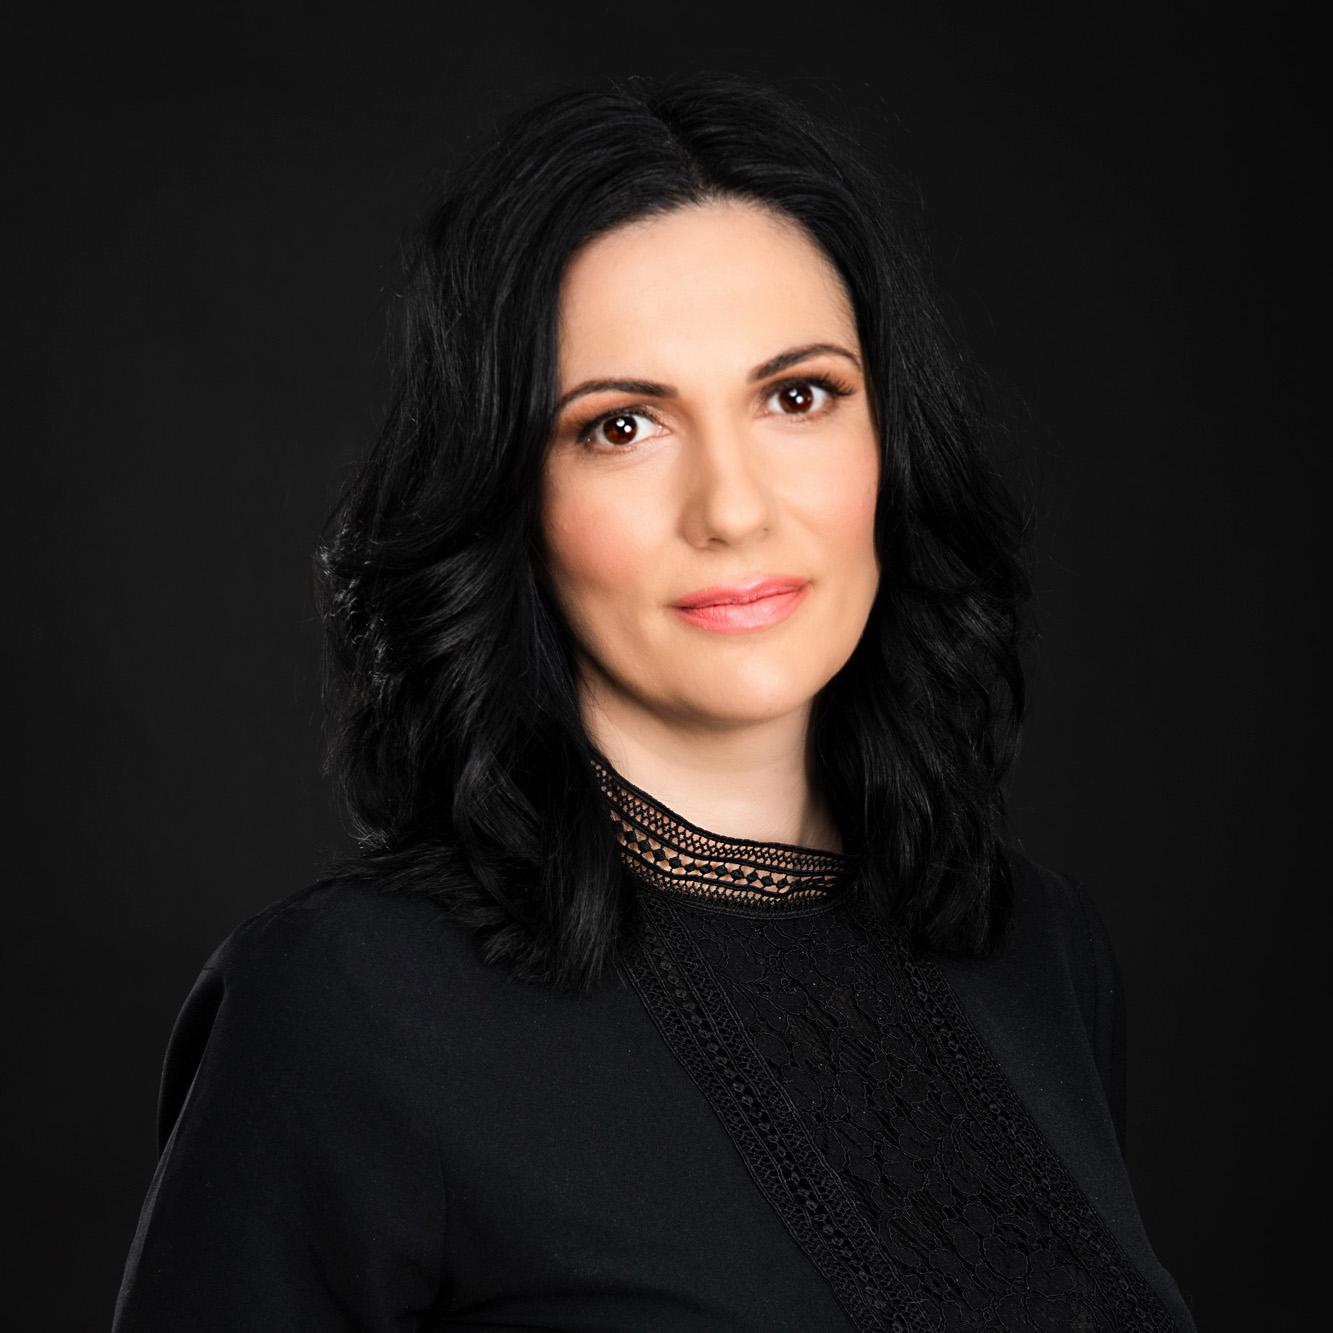 Kristina Vajda